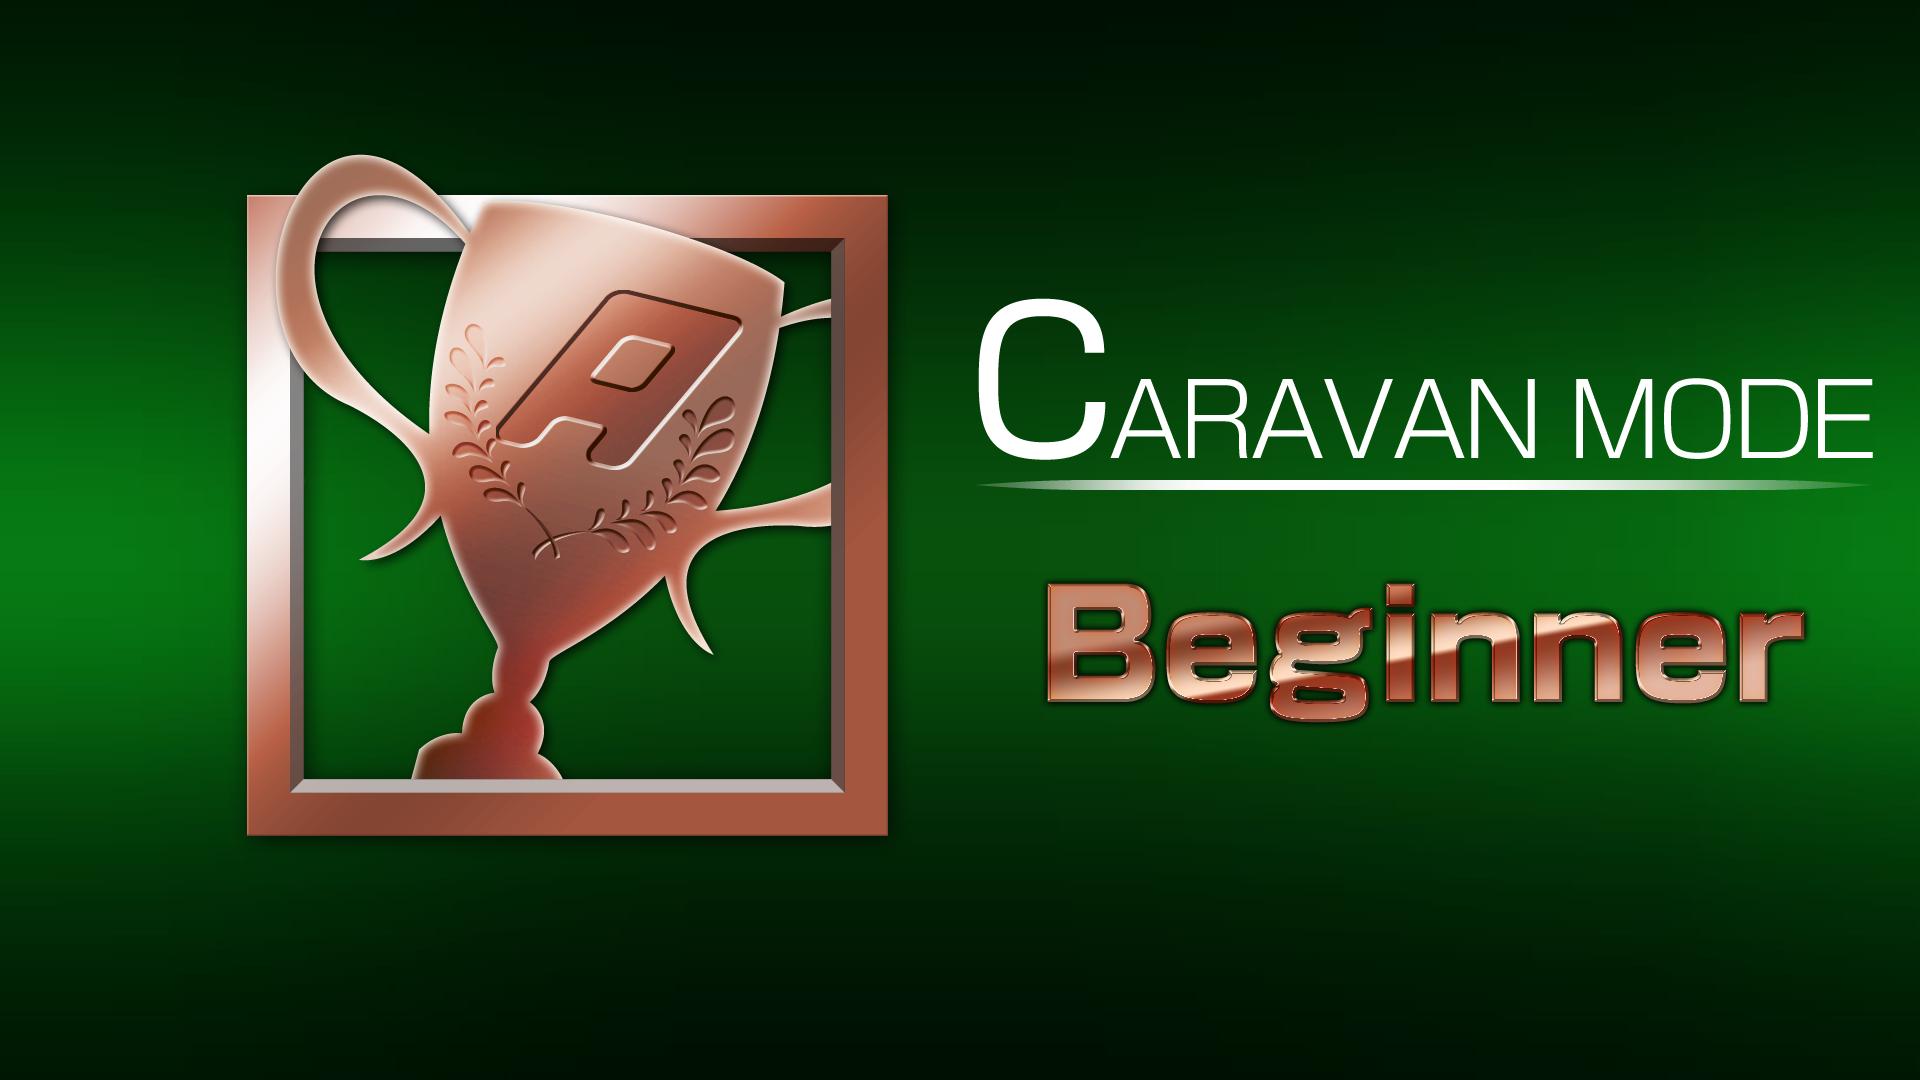 Icon for CARAVAN MODE 1 win(s)